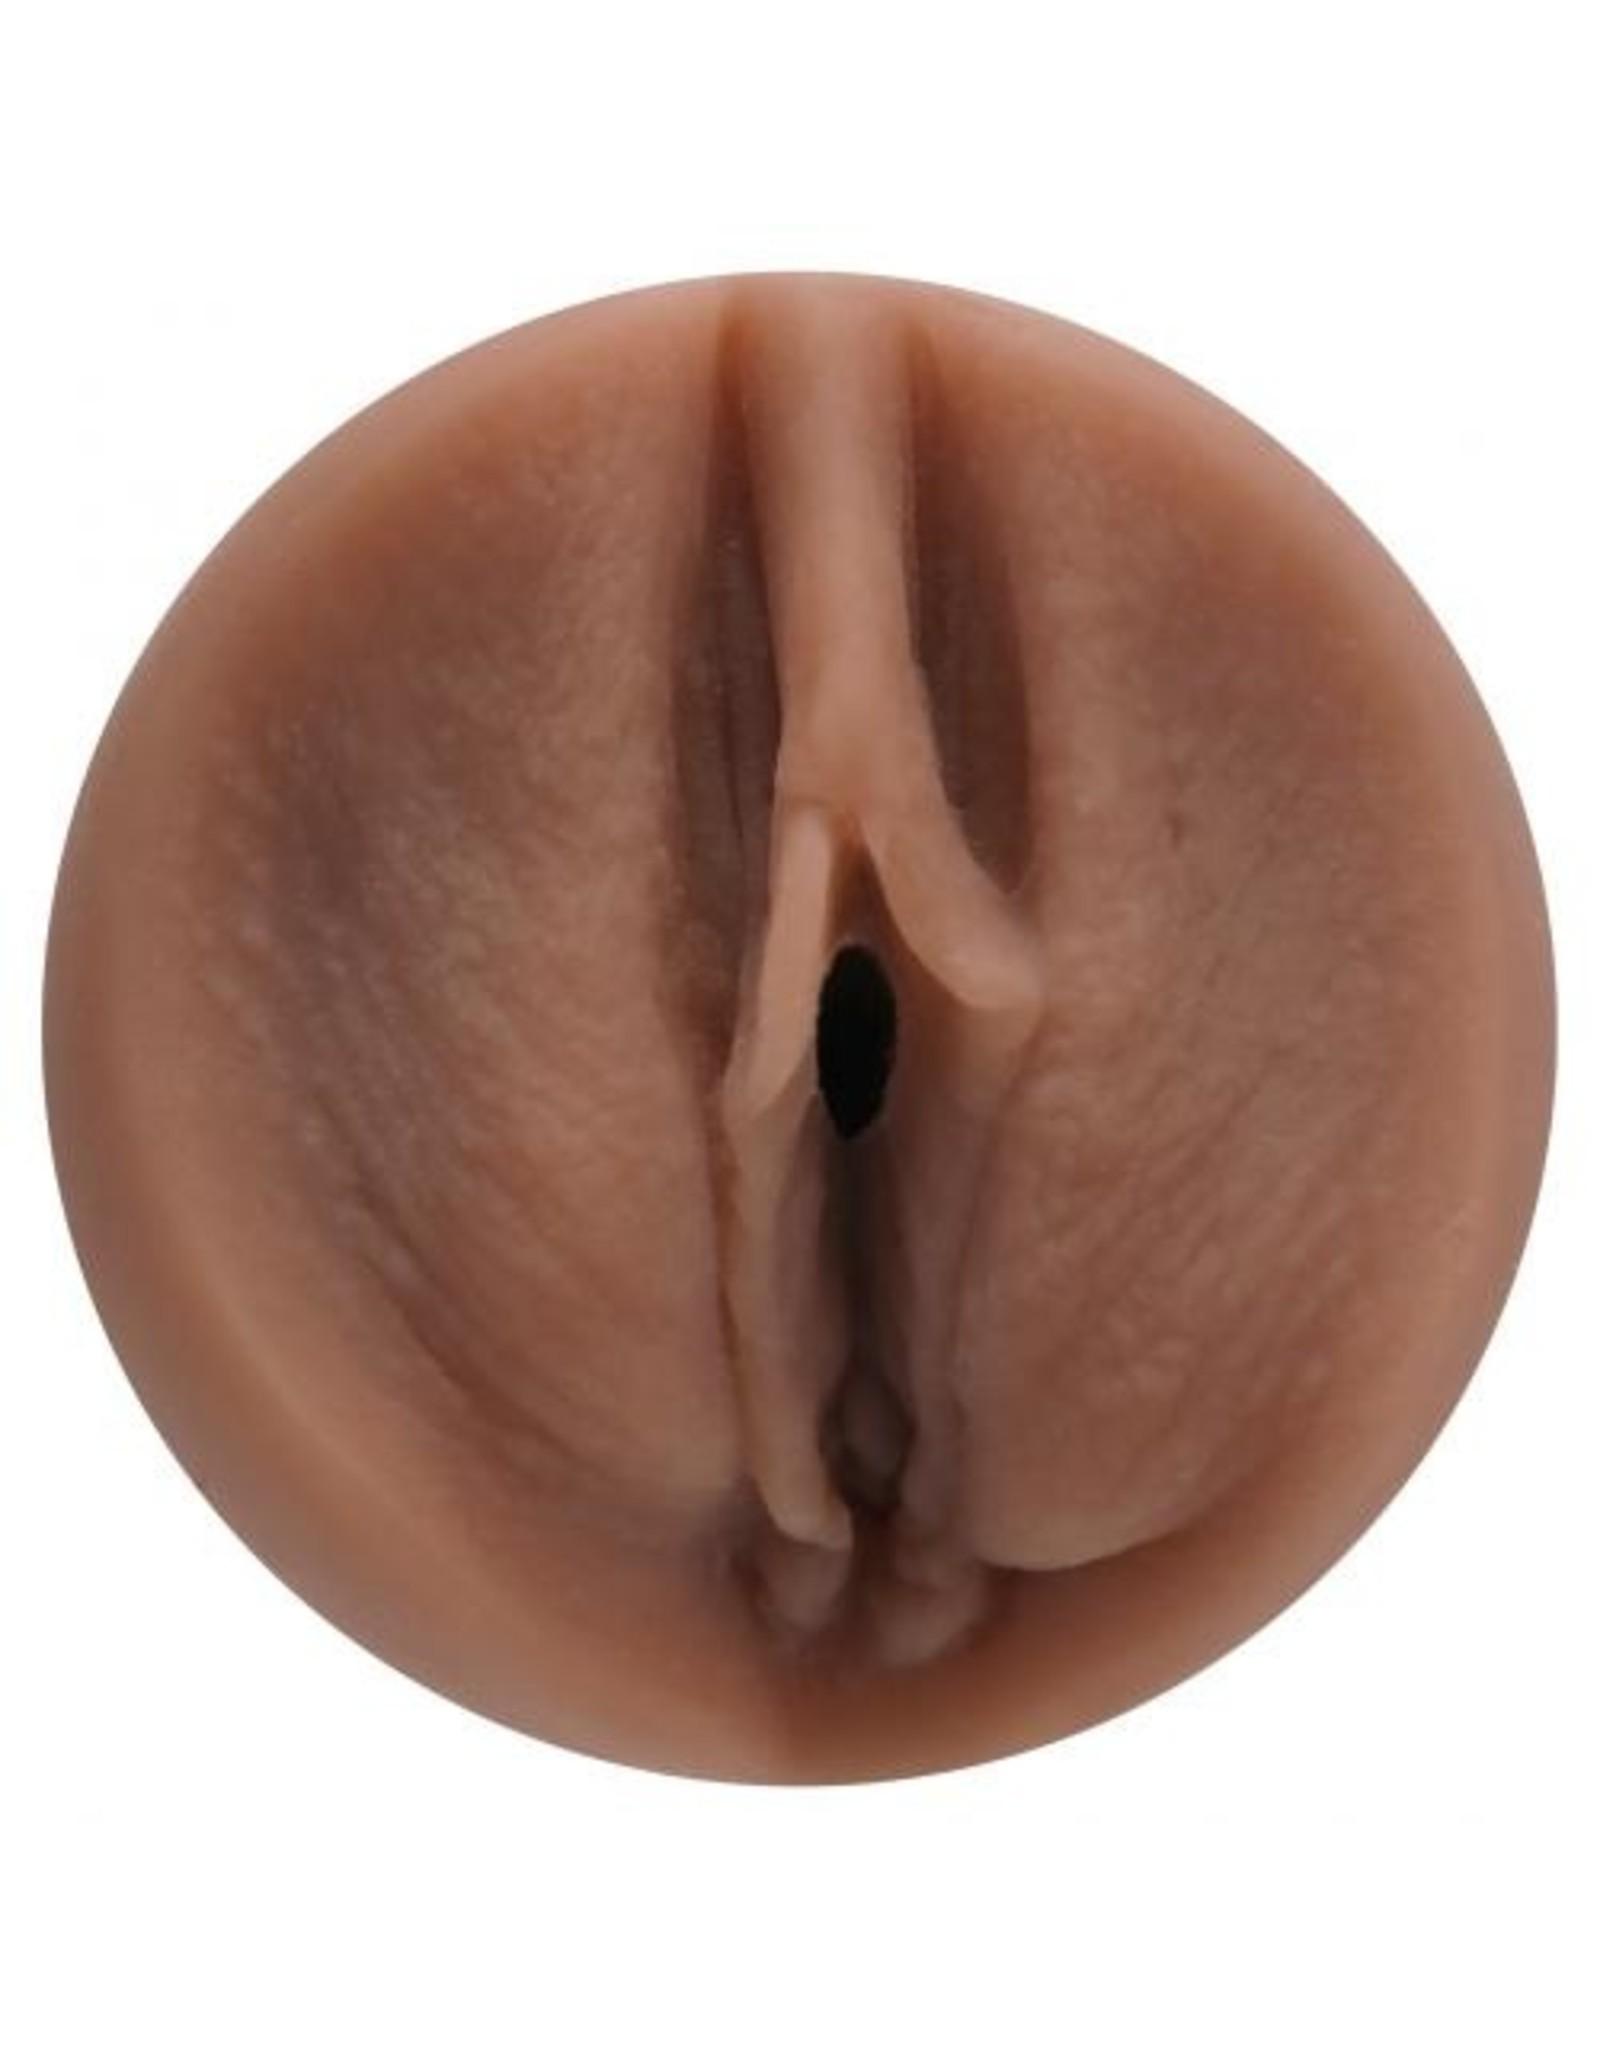 Main Squeeze Main Squeeze Karlie Redd